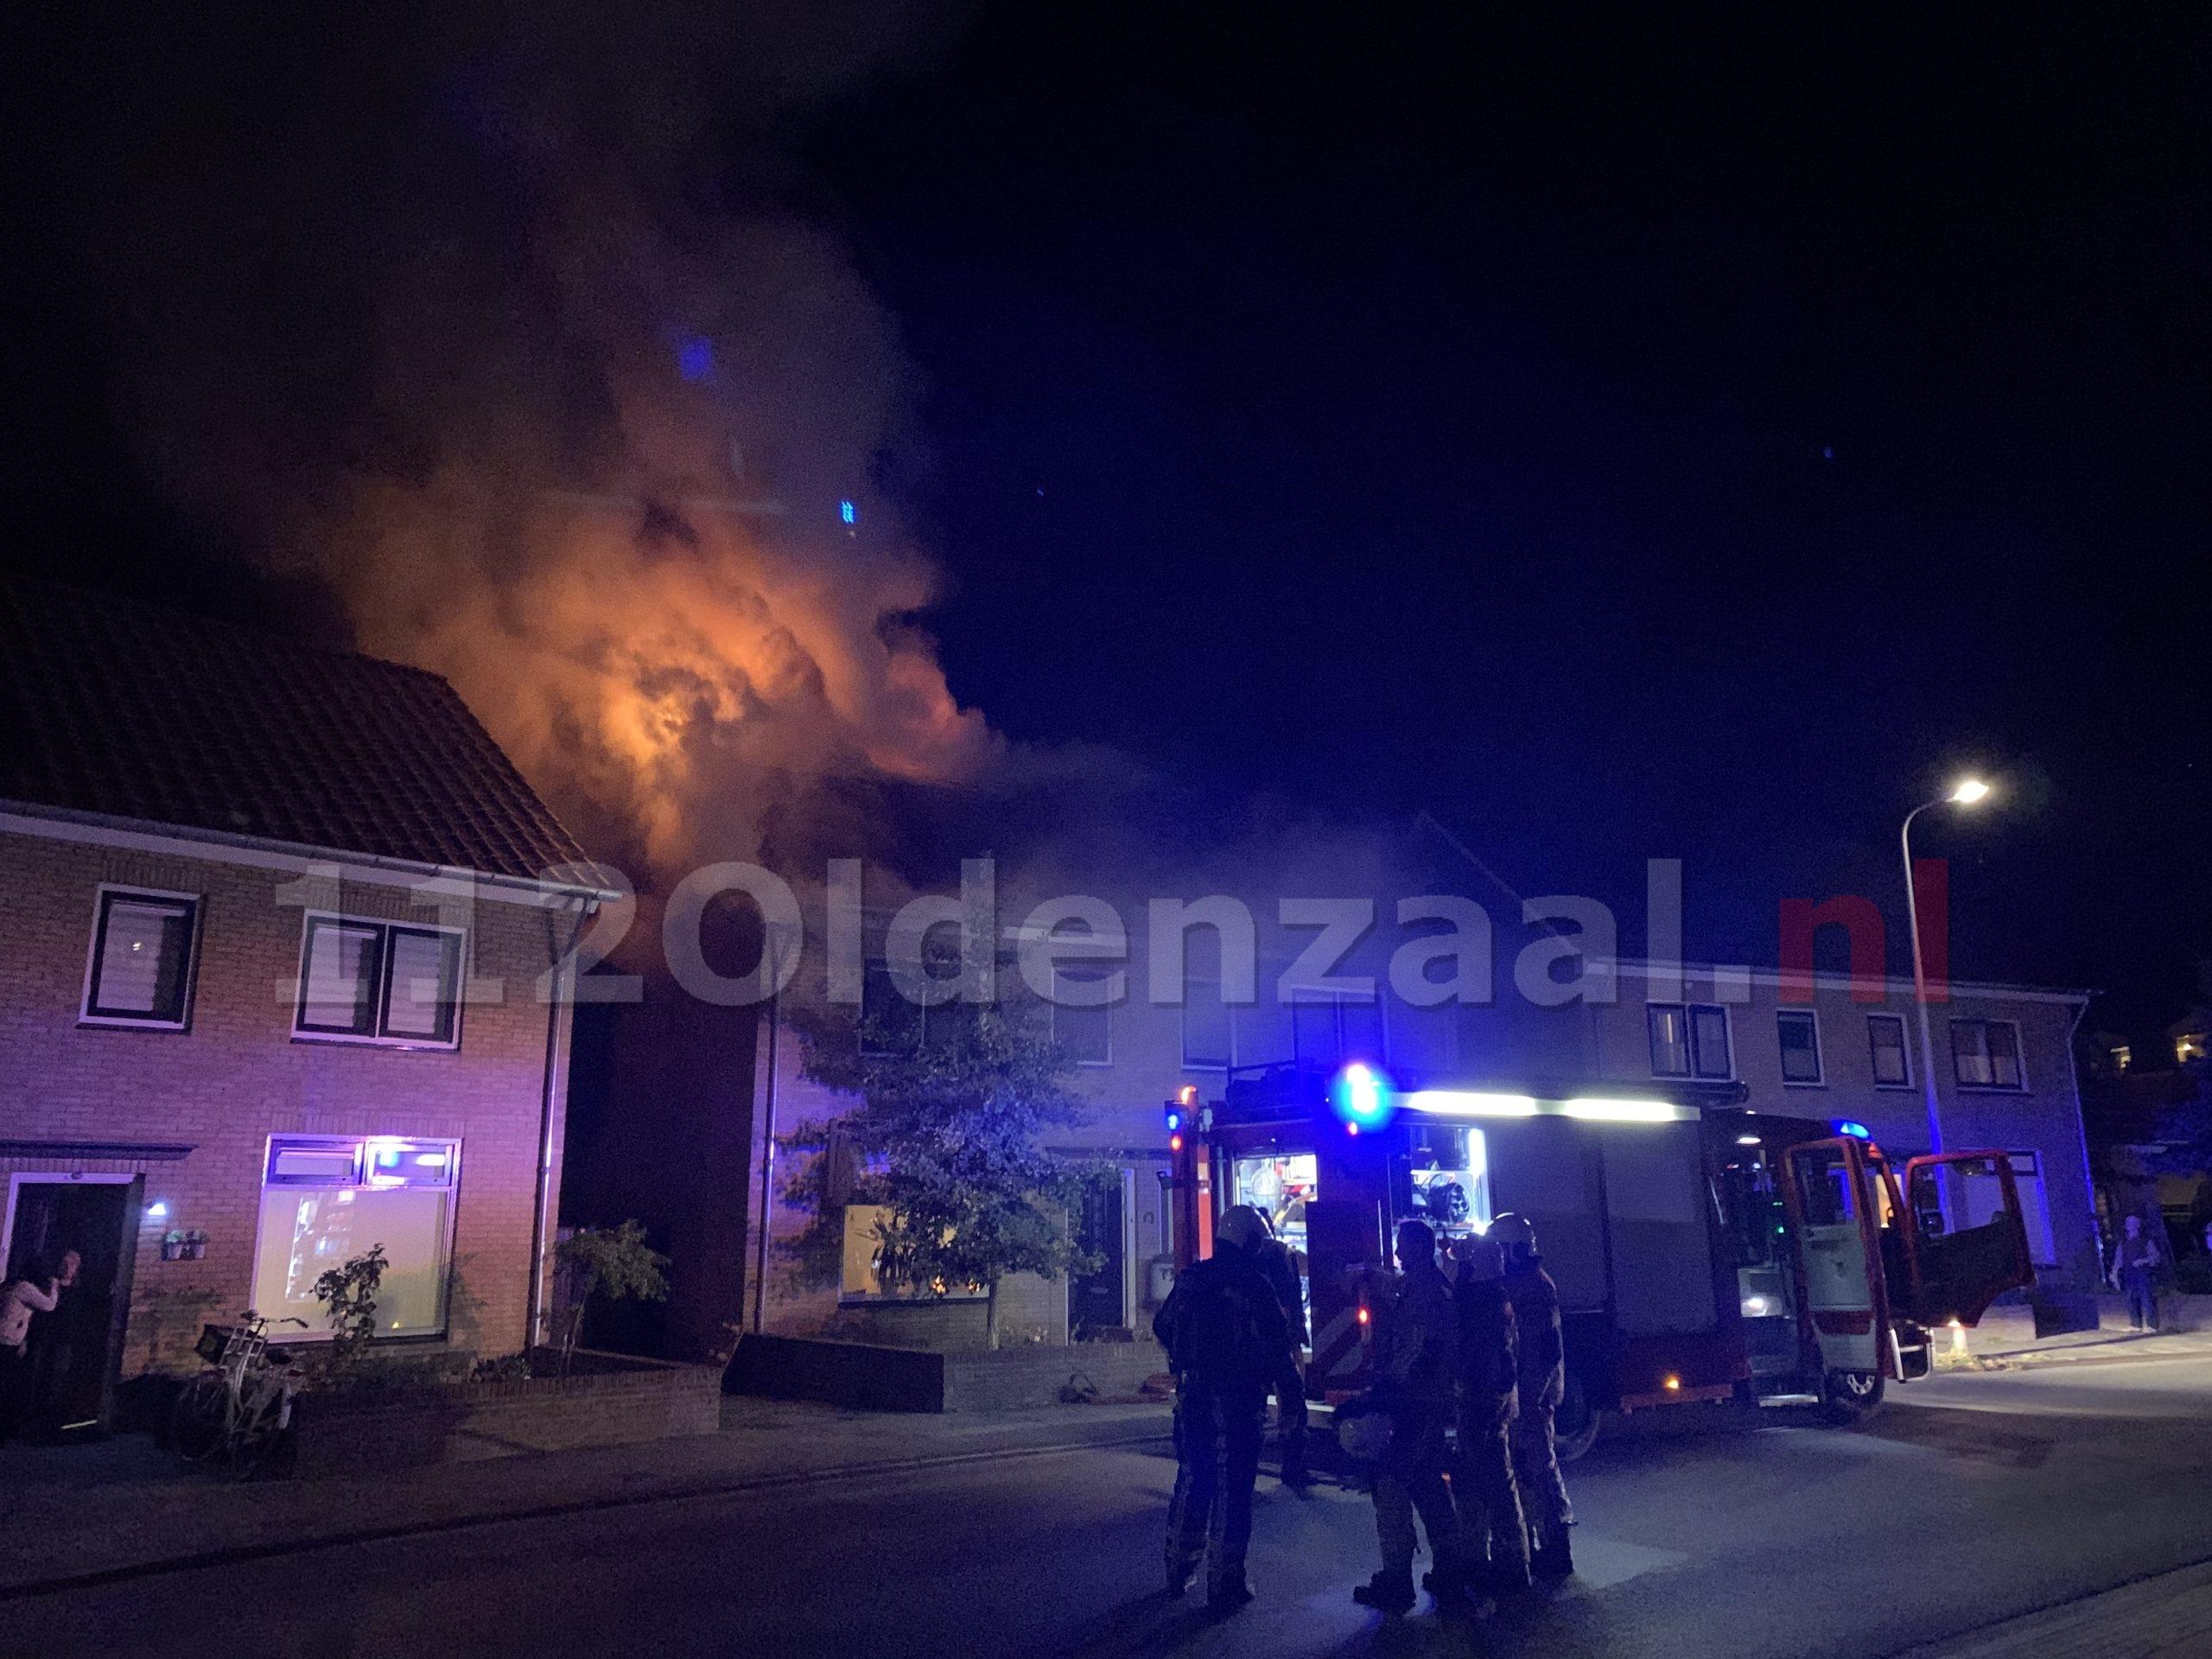 VIDEO: Woningen Oldenzaal onbewoonbaar na uitslaande brand